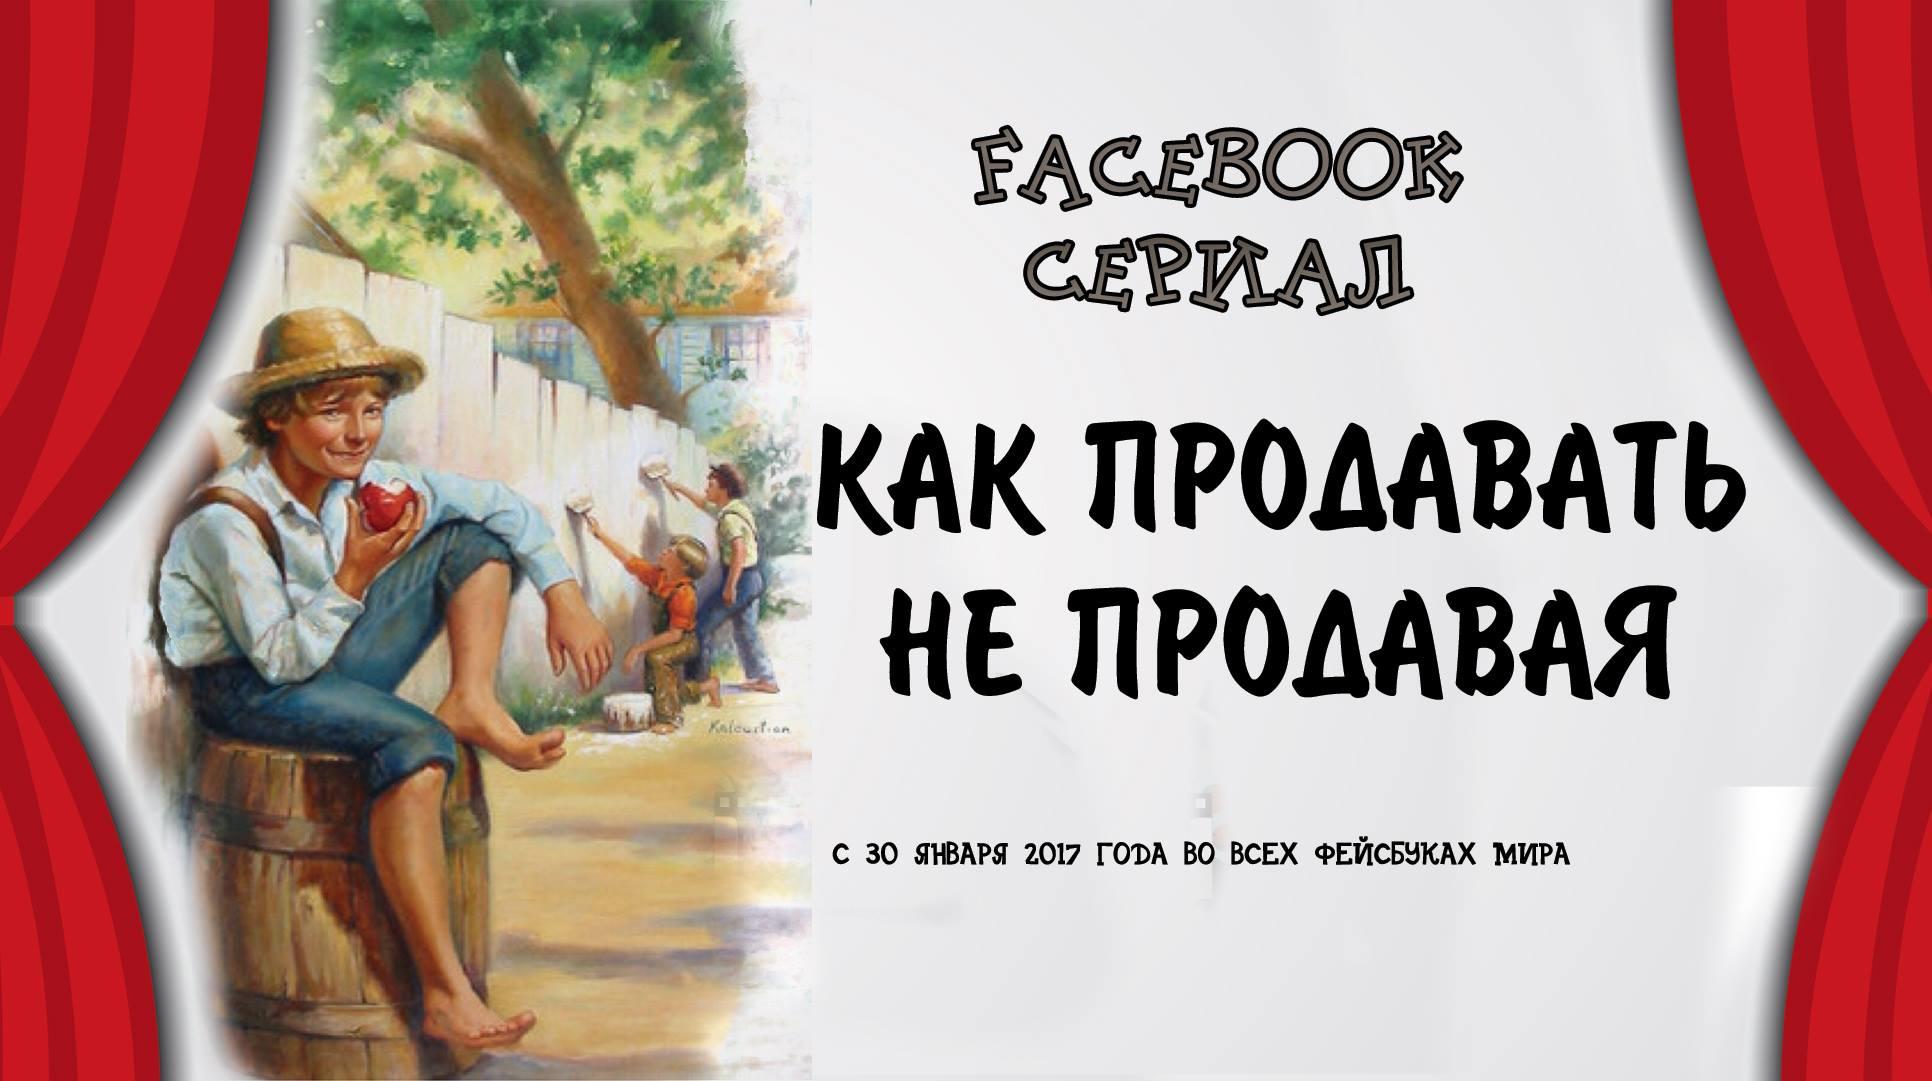 Онлайн проект Фейсбук сериал